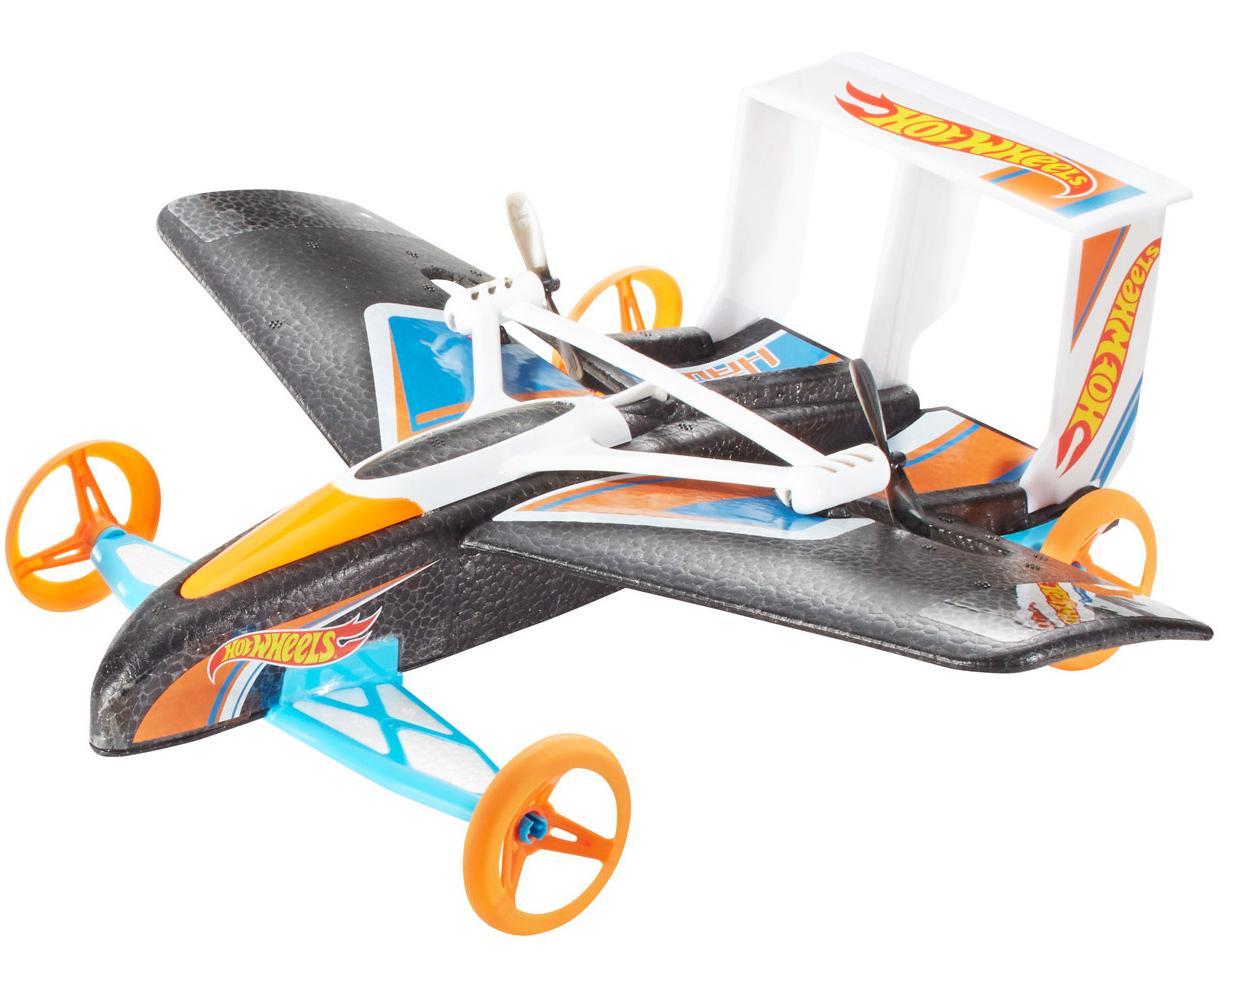 hot wheels street hawk remote control flying car amazing. Black Bedroom Furniture Sets. Home Design Ideas